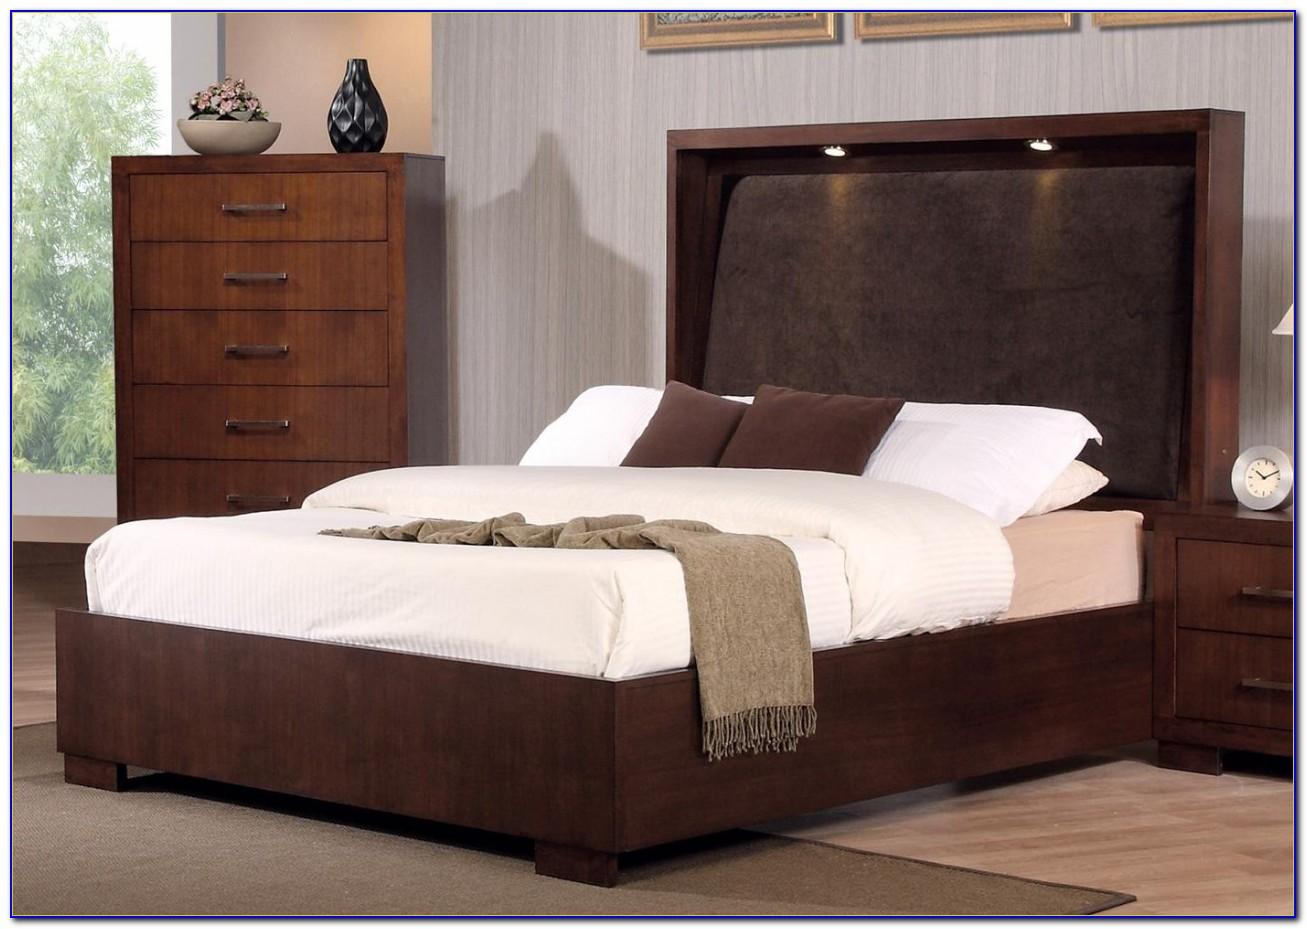 Cali King Bedding Set